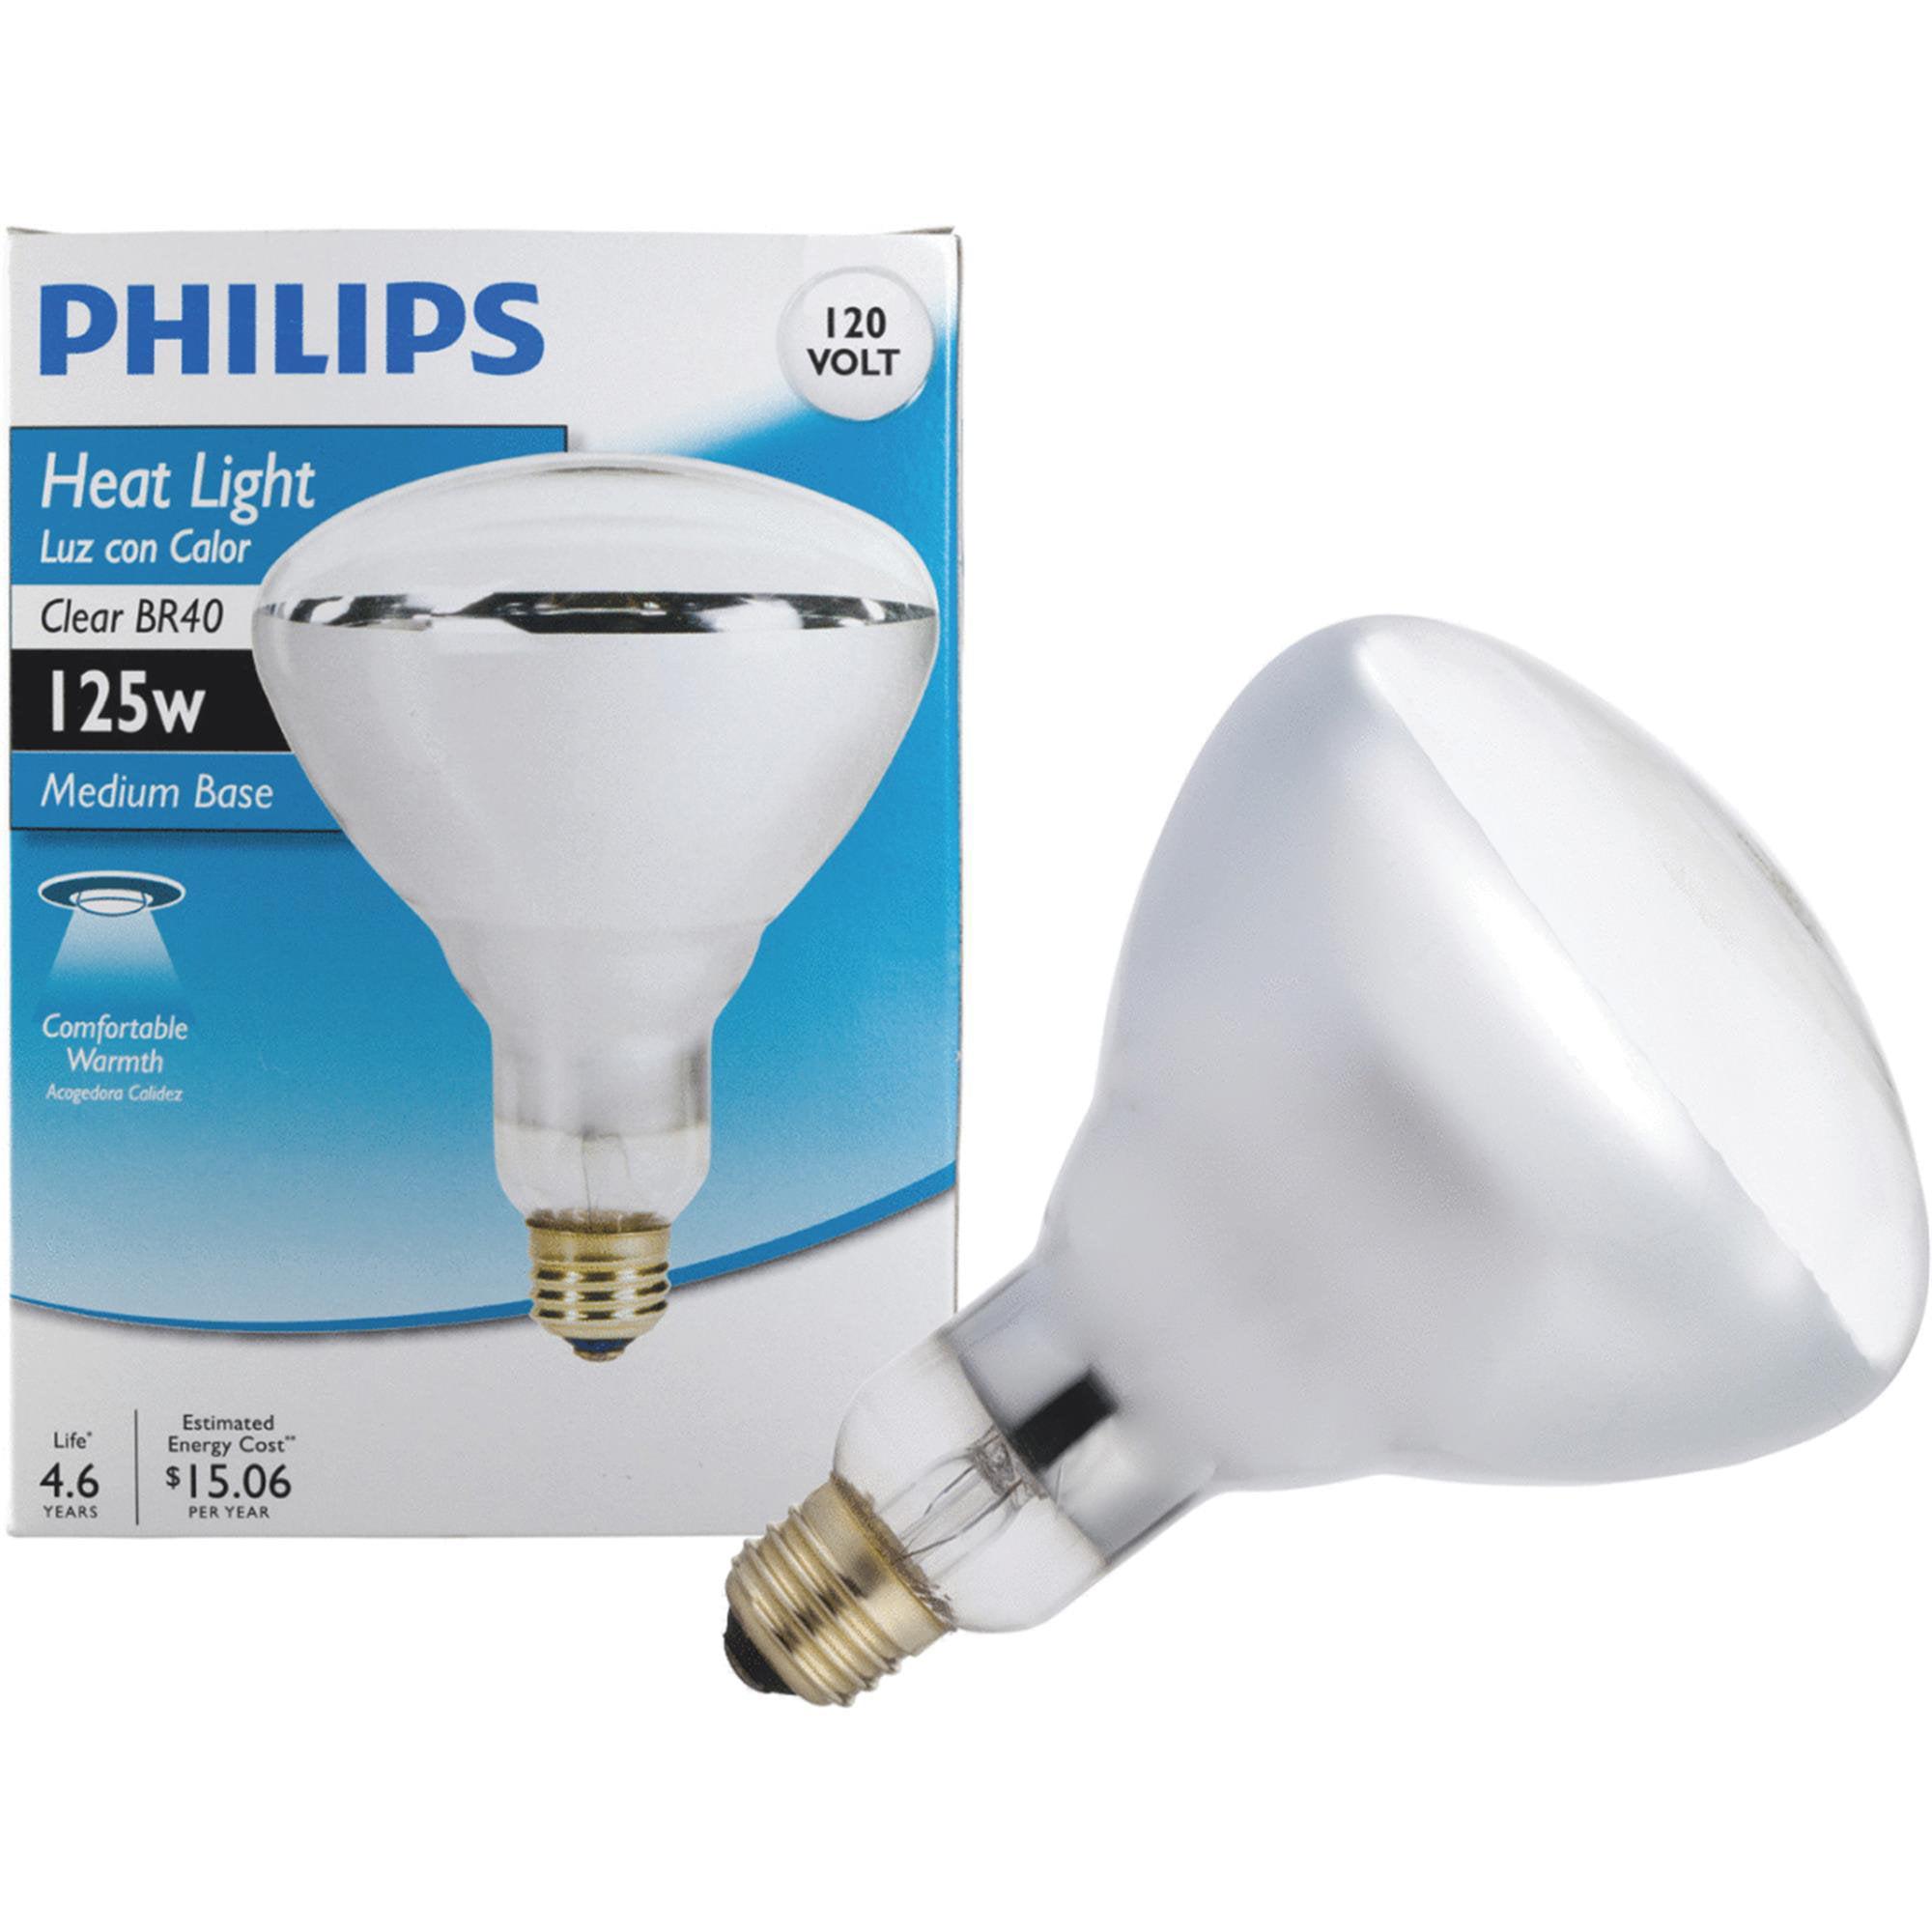 Philips BR40 Incandescent Heat Light Bulb - Walmart.com